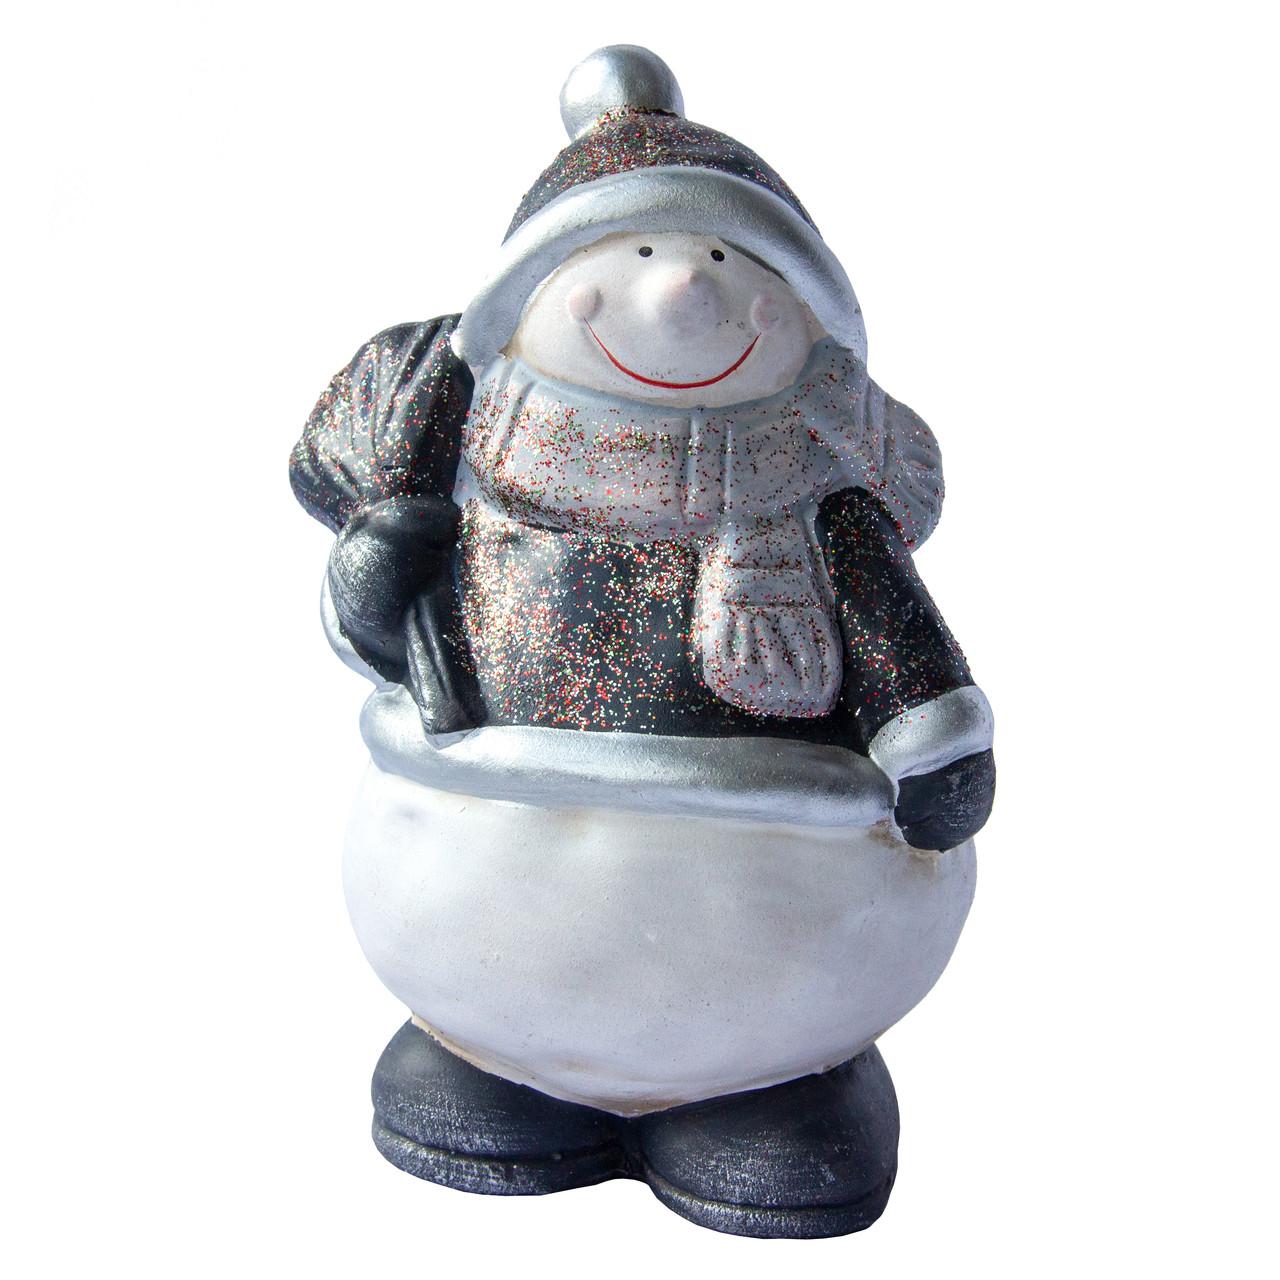 Декоративная фигурка - Снеговик, 14 см, белый с серым, керамика (440917)